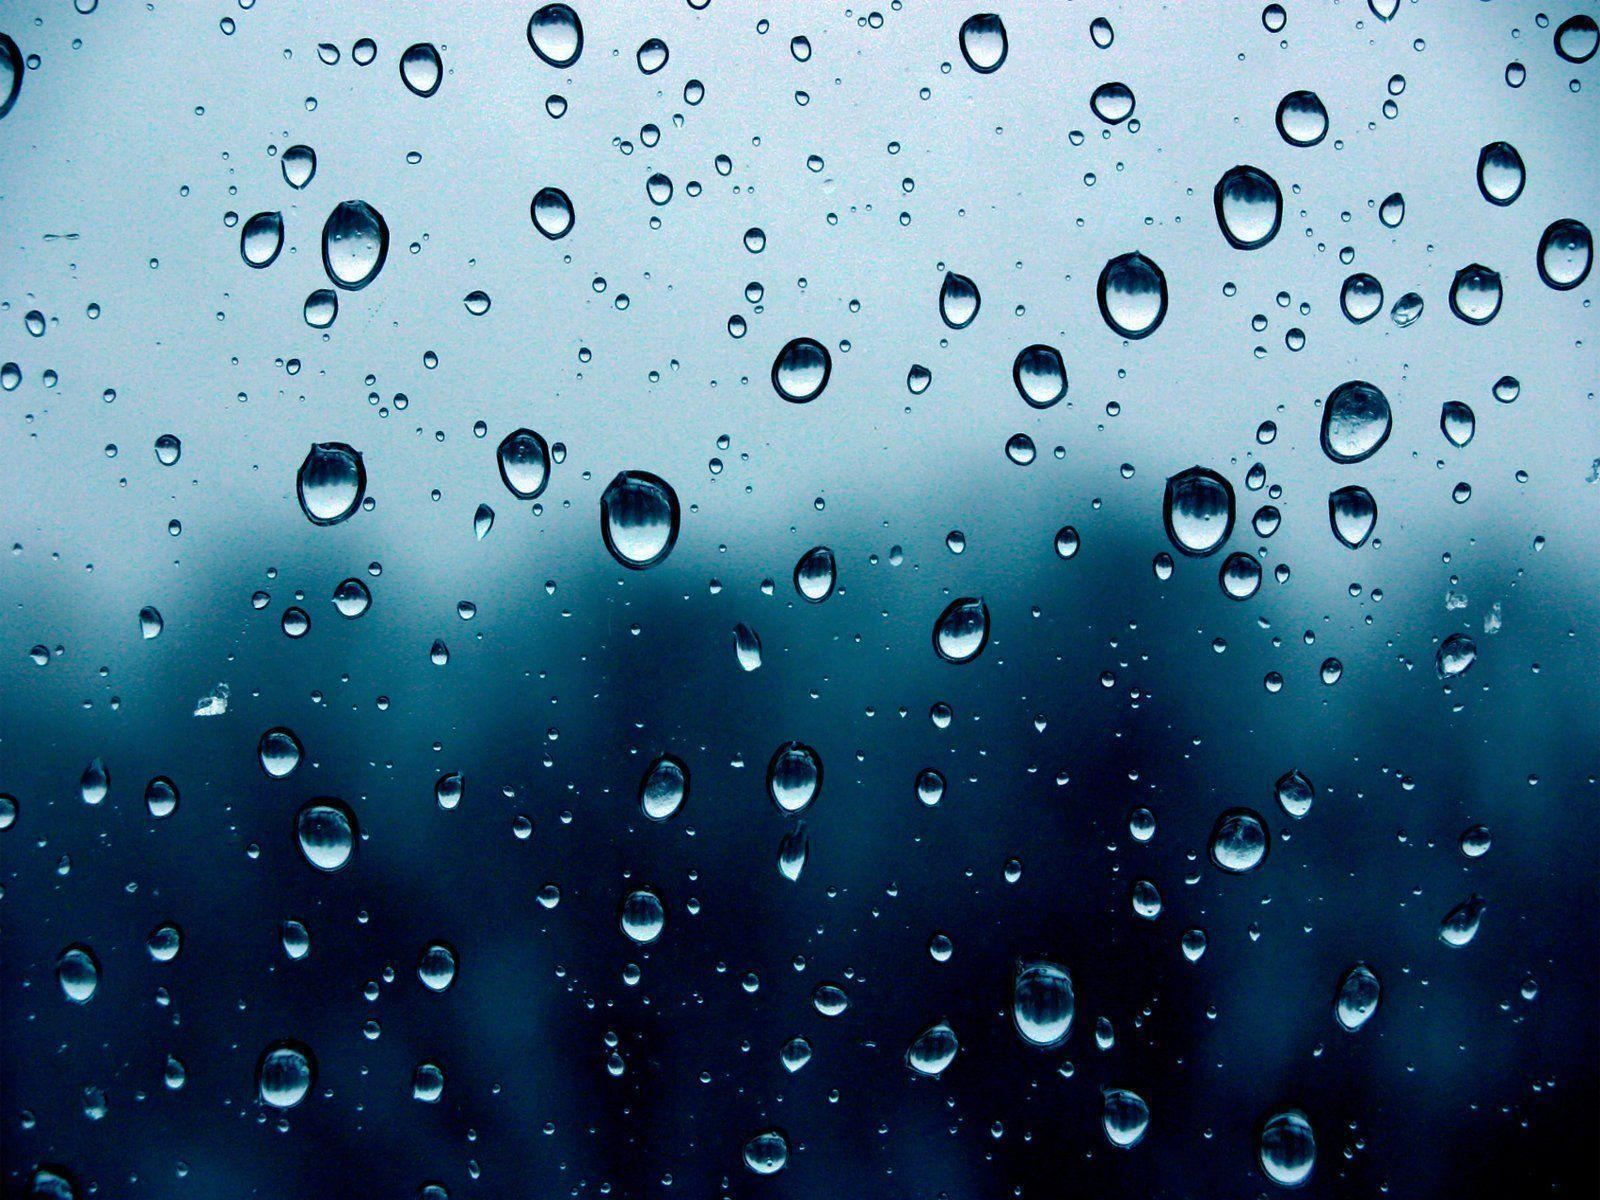 Water Drop HD Wallpapers 1600x1200